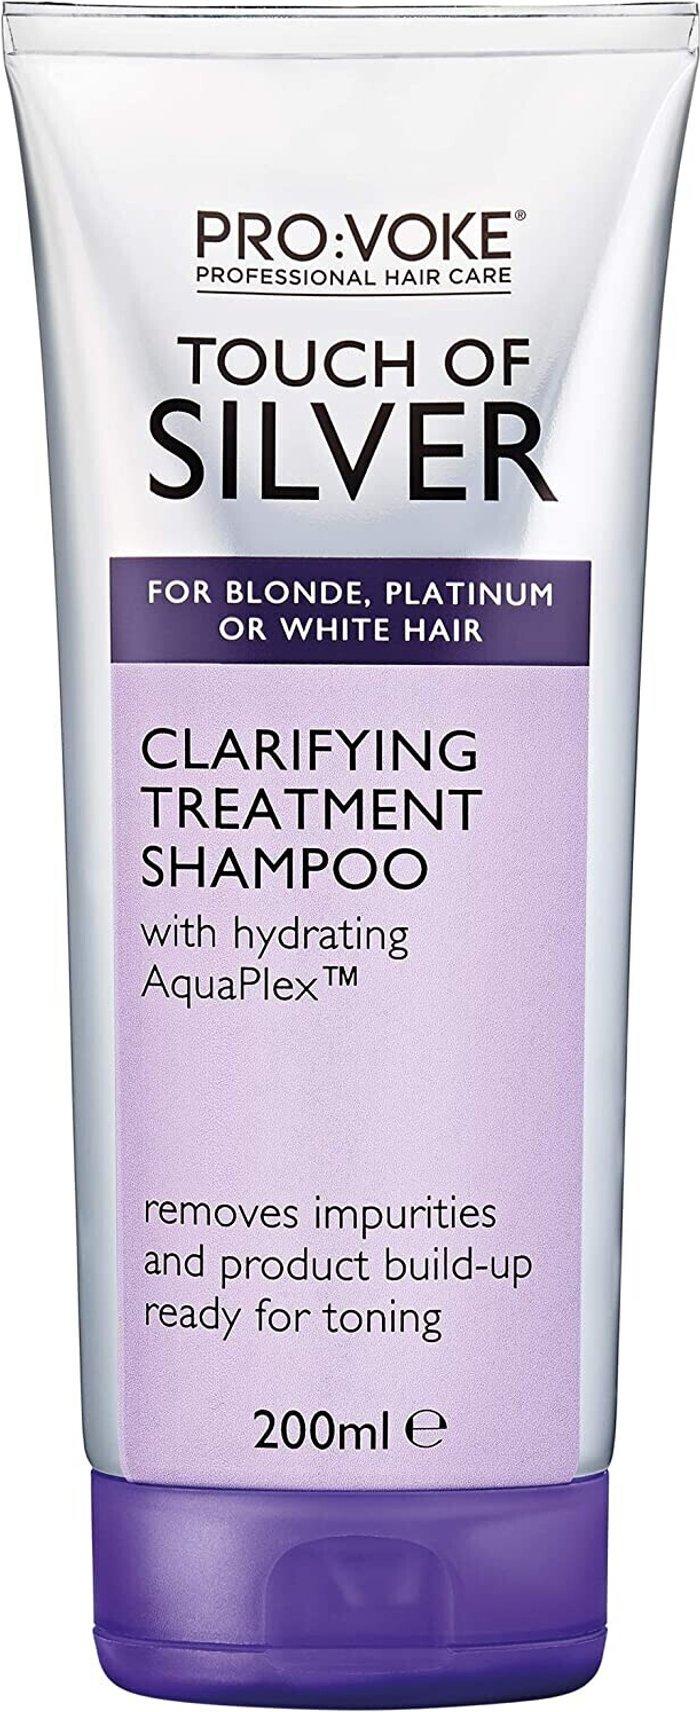 Pro Voke Pro Voke Touch Of Silver Clarifying Shampoo 200ml